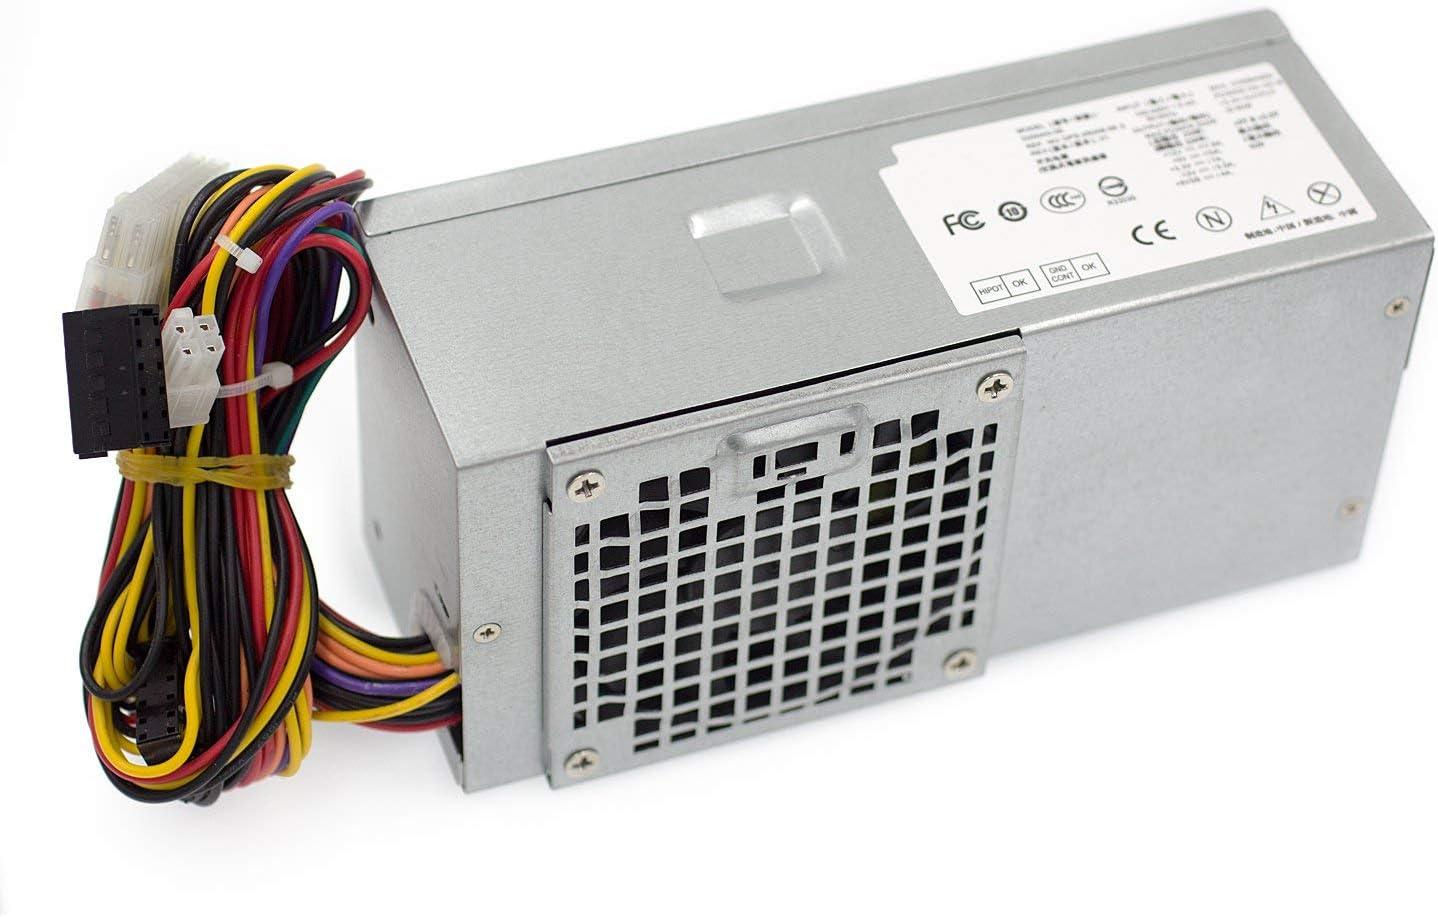 Slimline 250W Power Supply Unit PSU W208D Dell OptiPlex 390 Small Form Factor